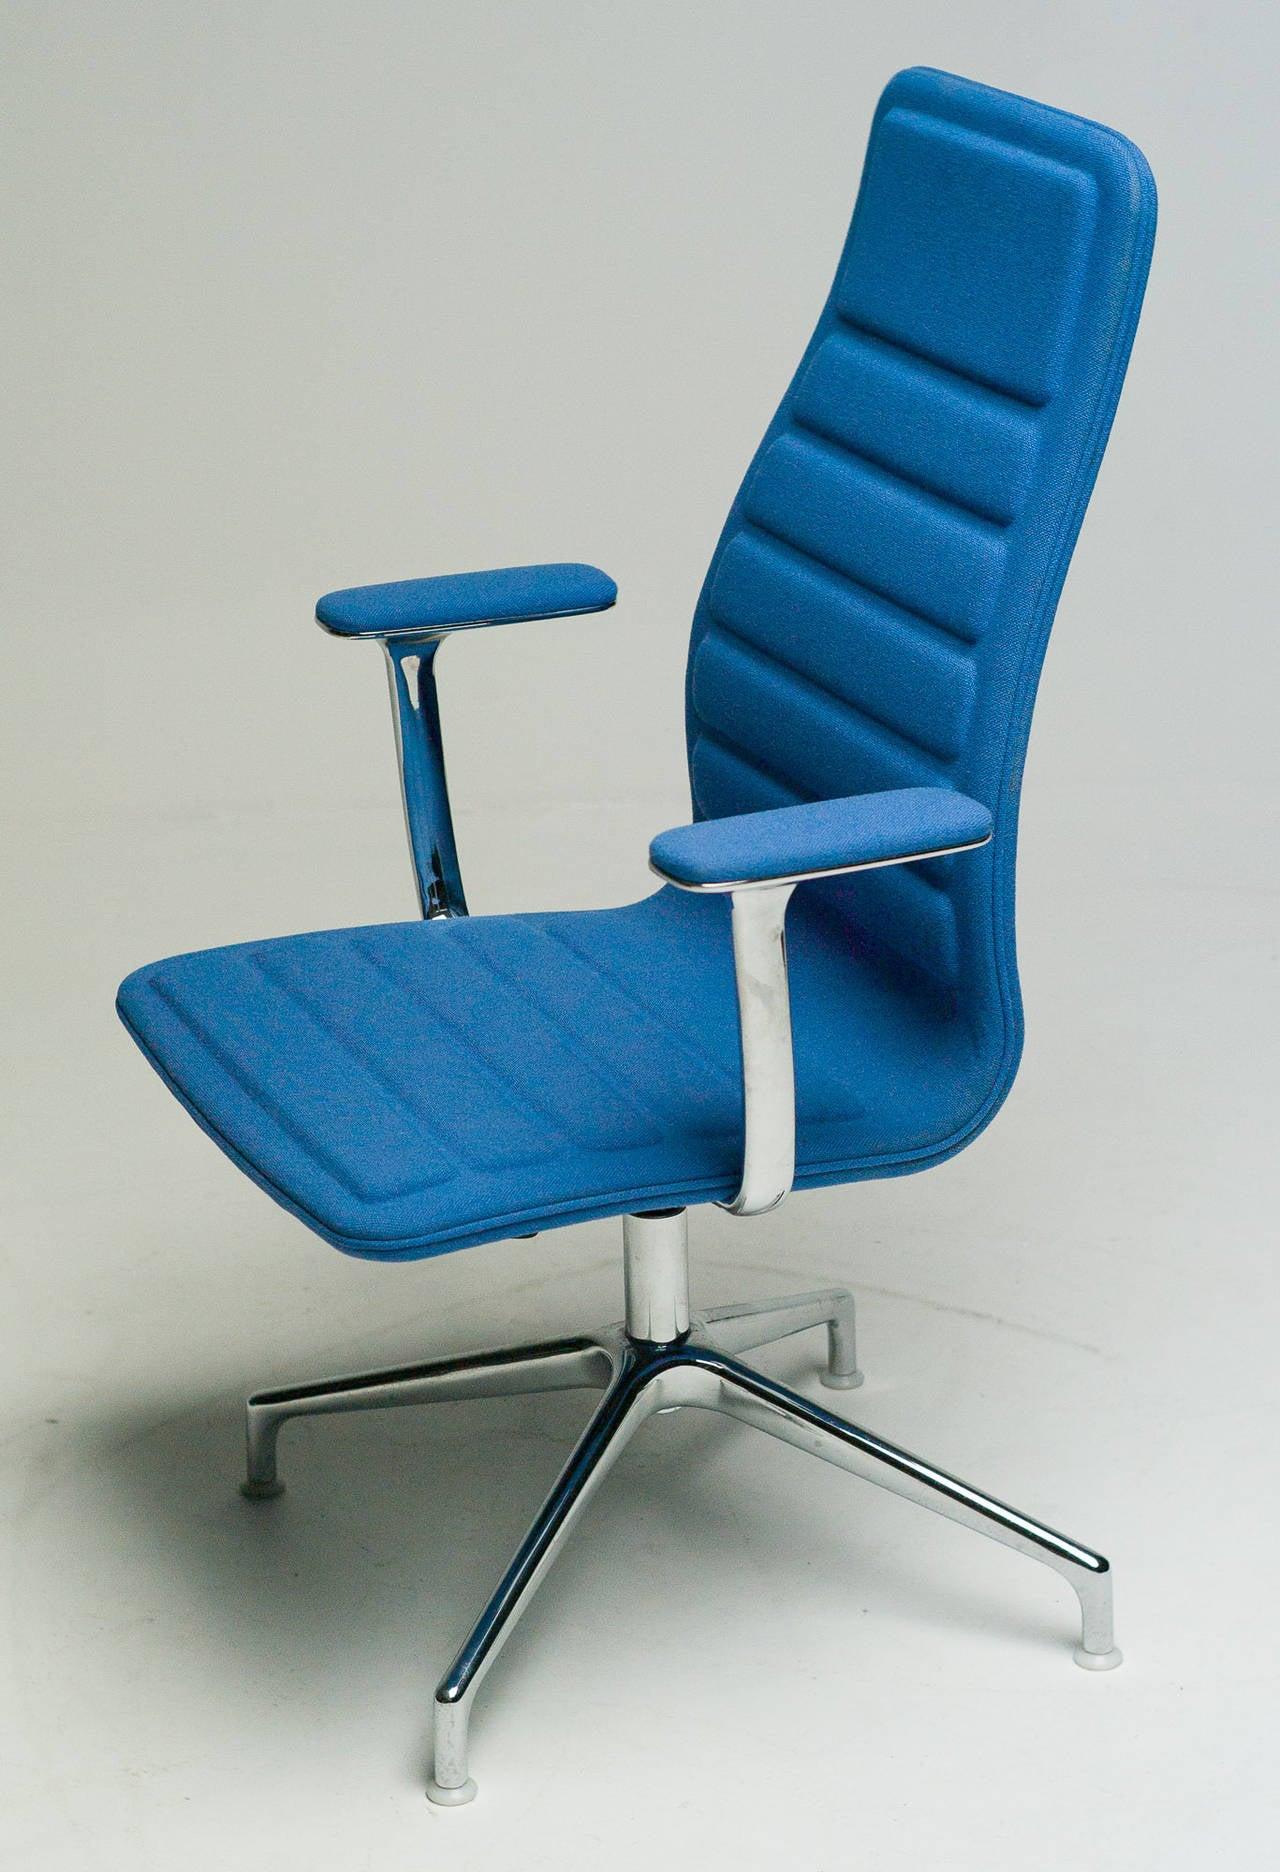 Lotus Chair Designed by Jasper Morrison at 1stdibs